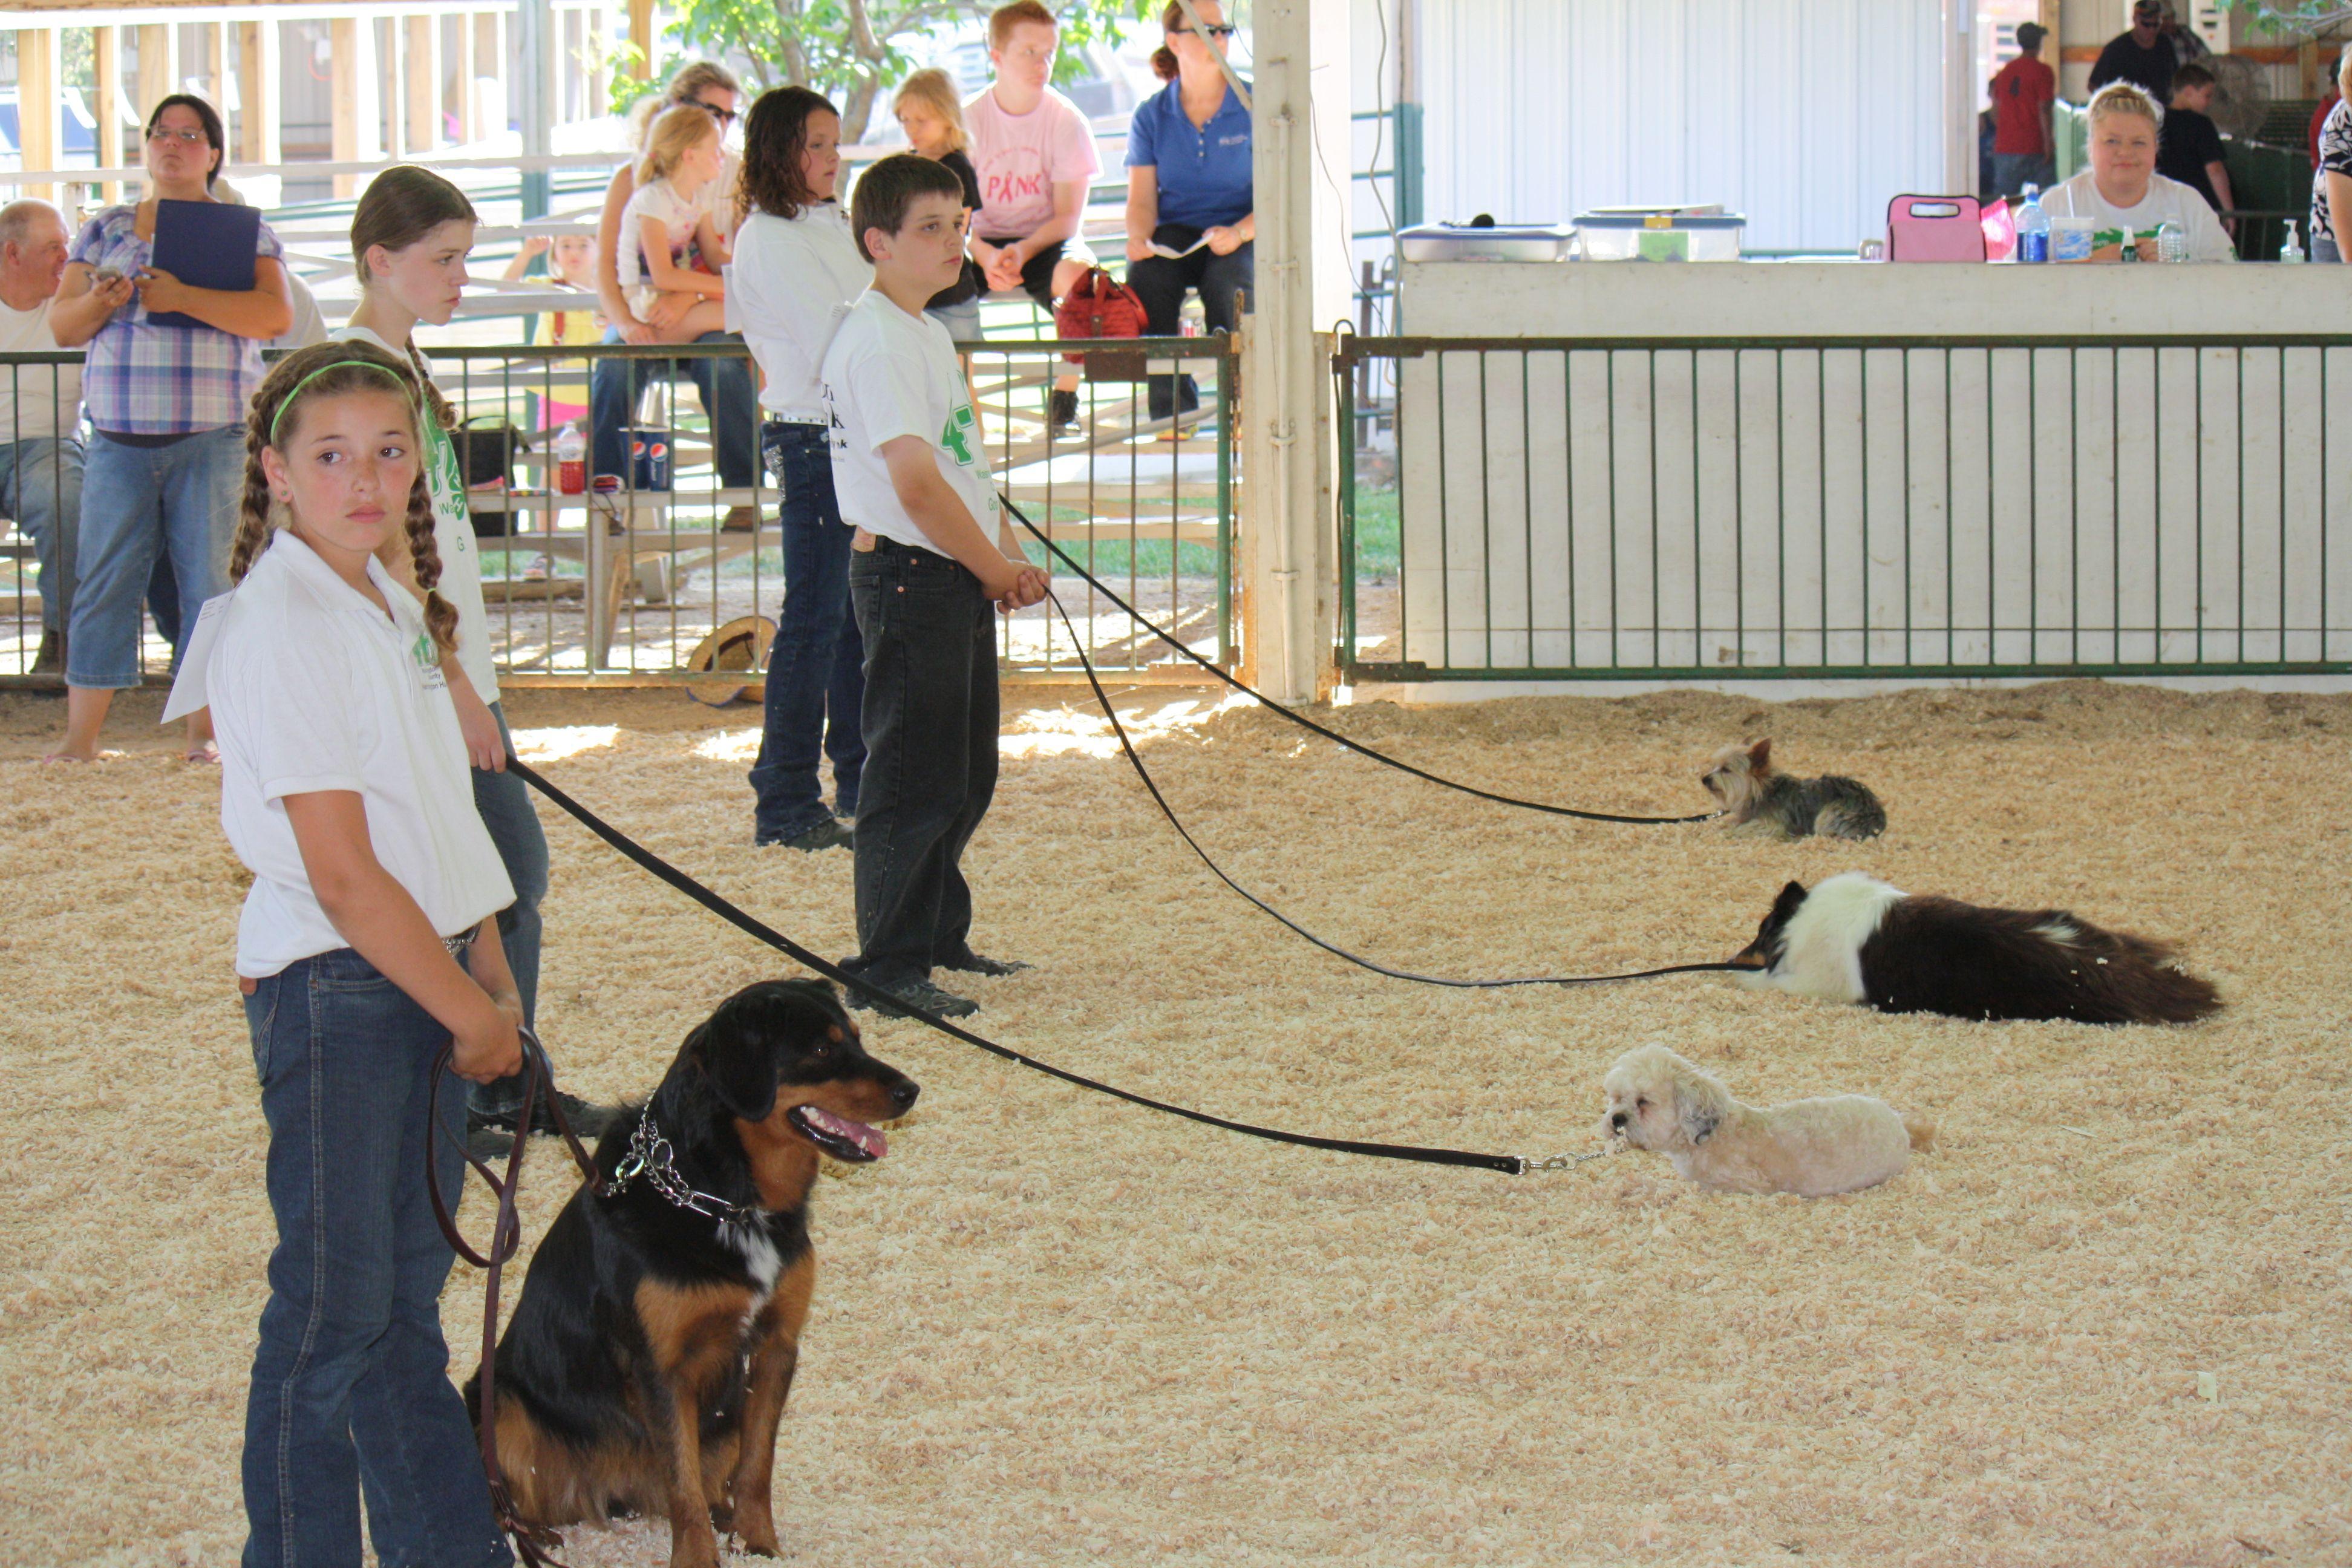 Day 195 4 H Dog Obedience Show Dogs Aggressive Dog Dog Behavior